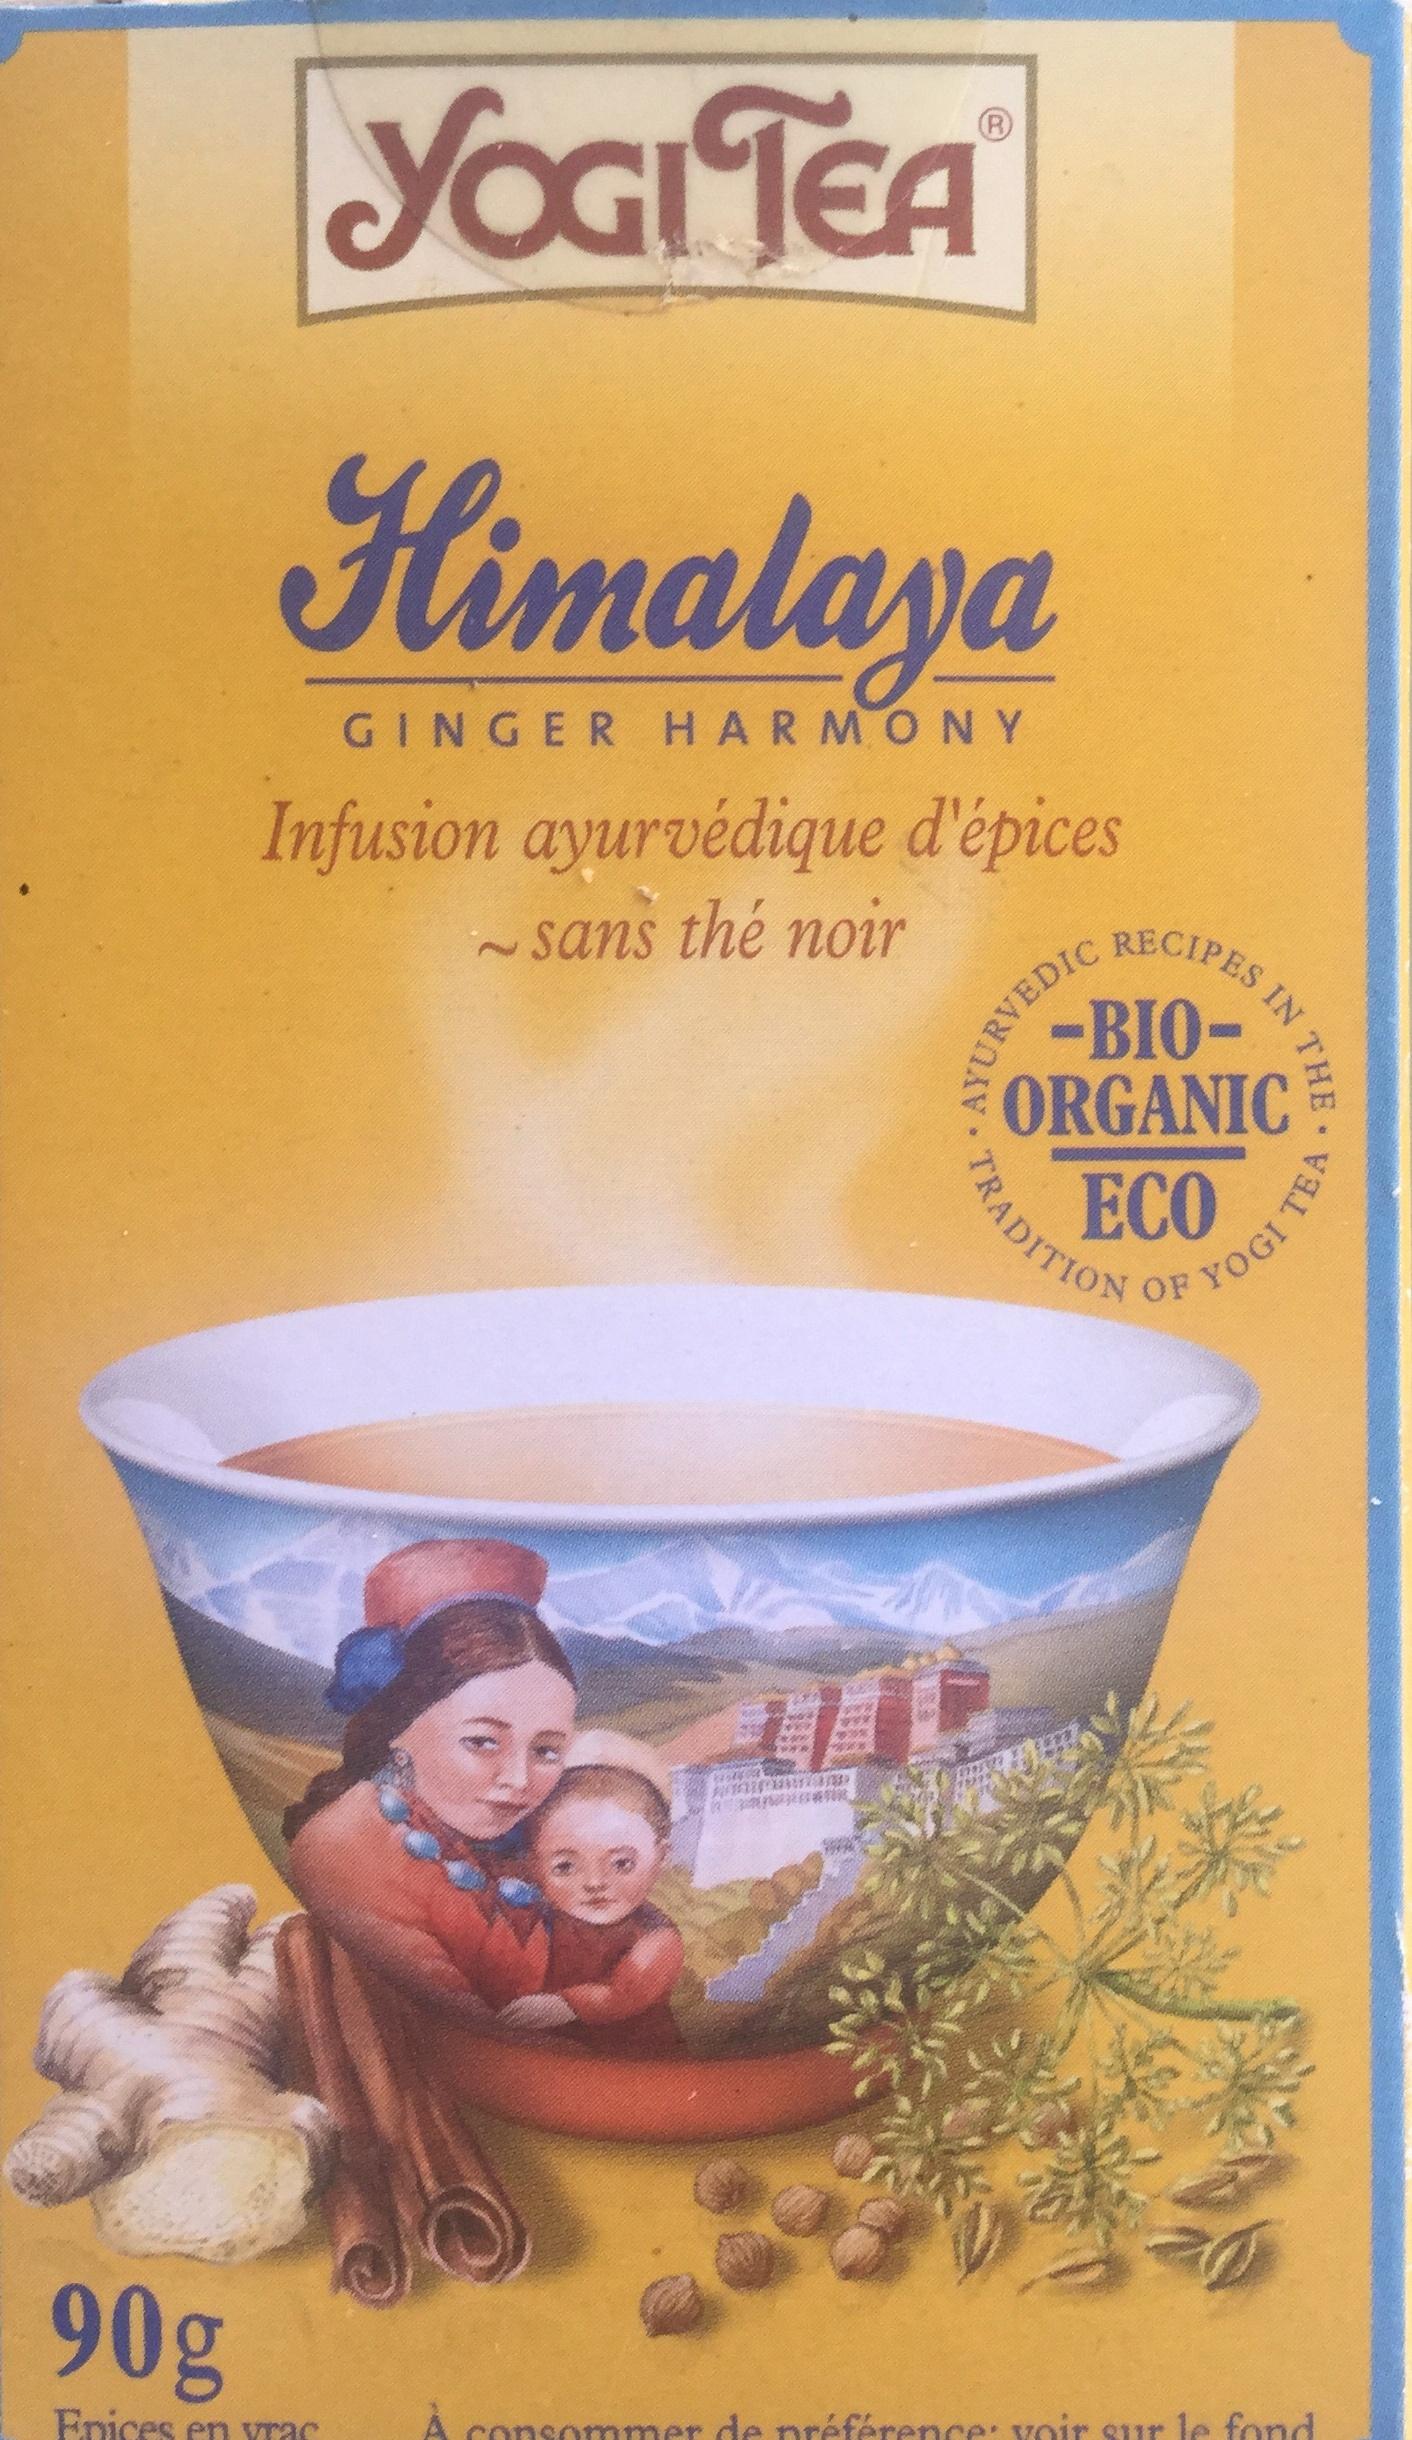 Himalaya - Ginger Harmony - Product - fr